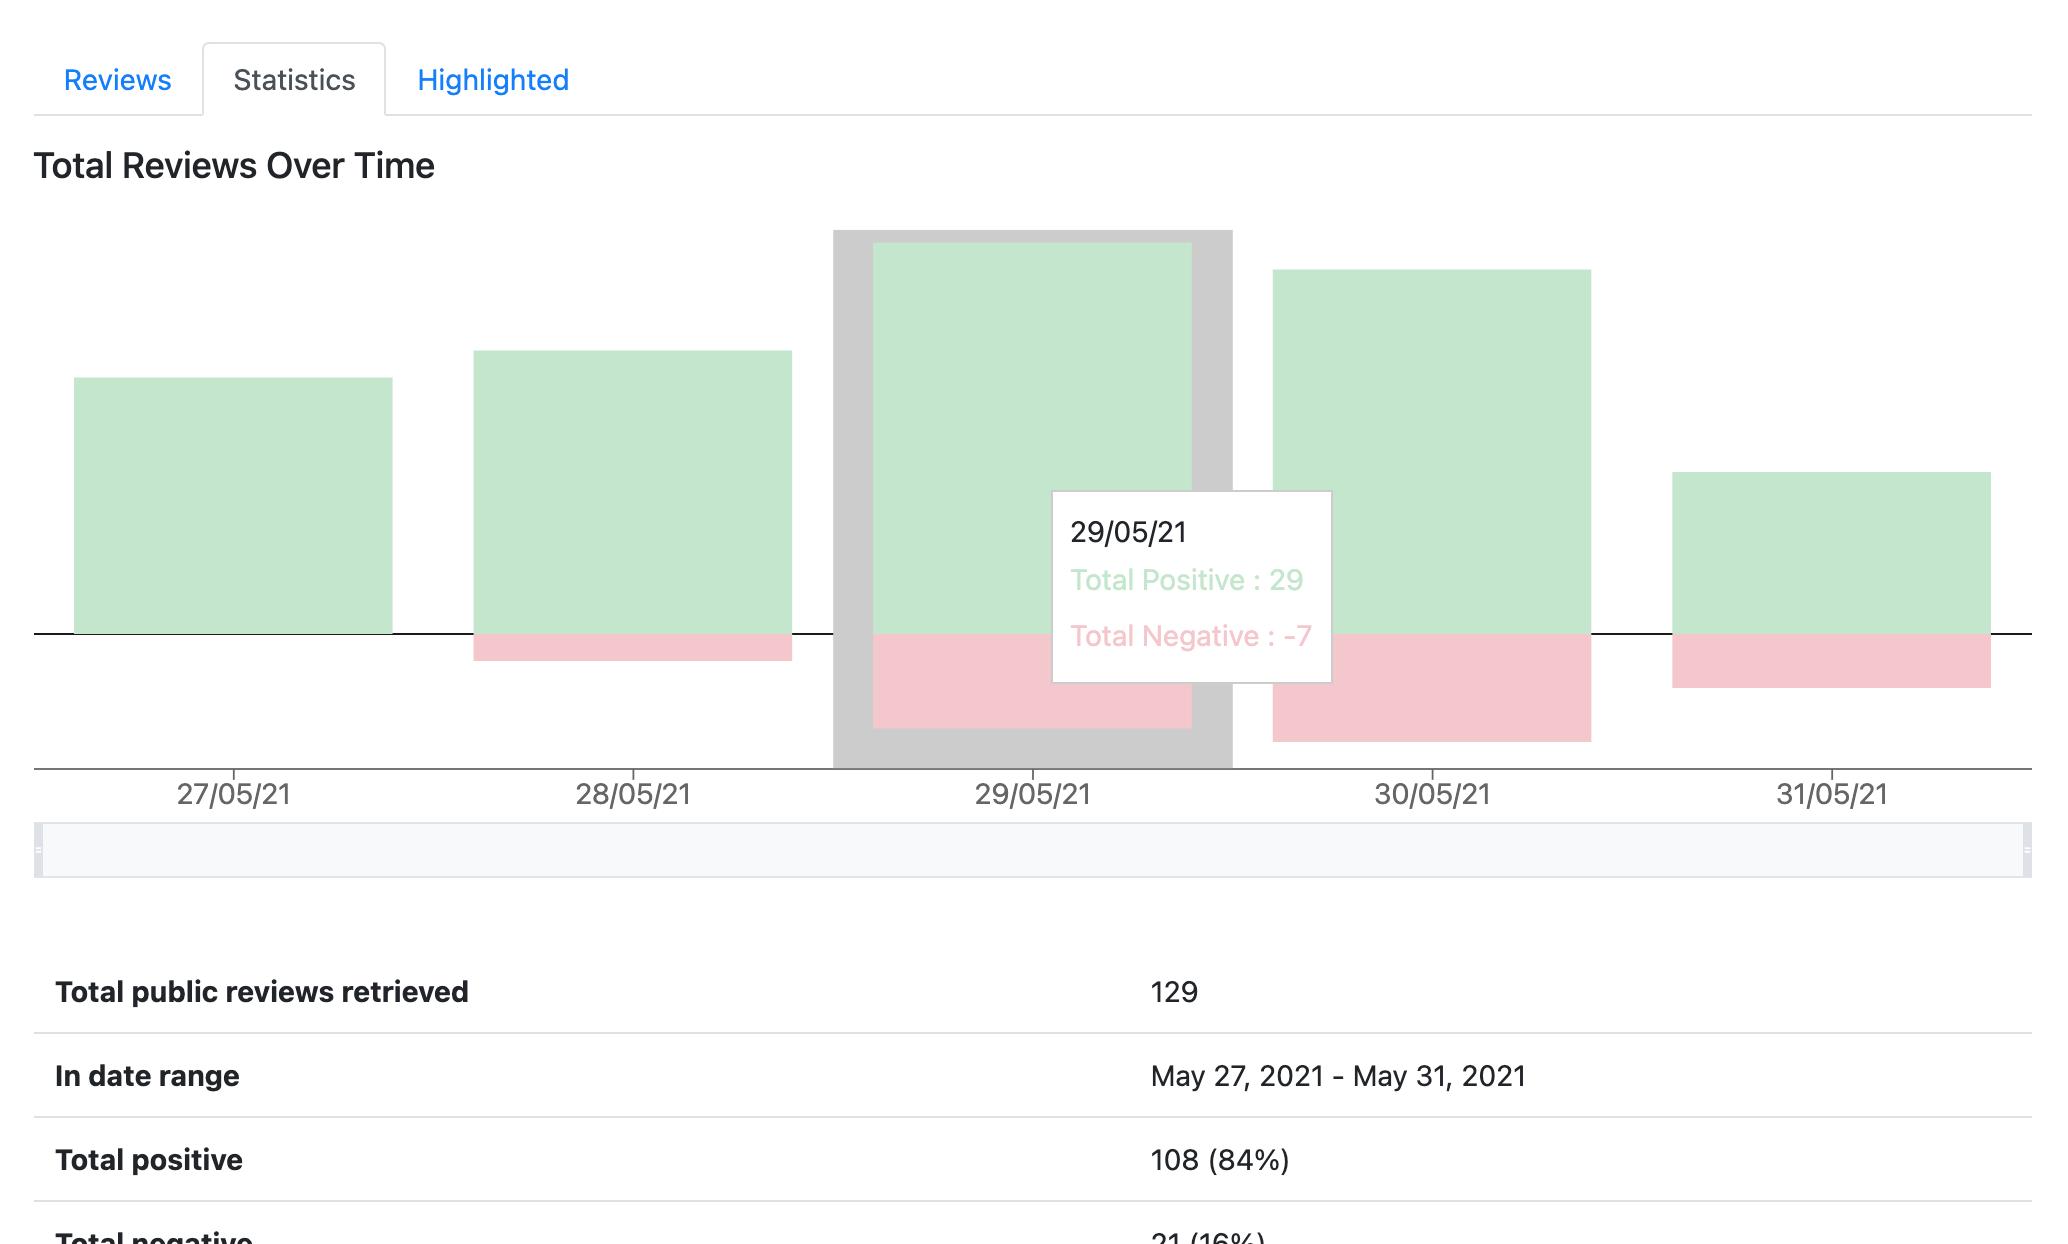 A screenshot of the Steam review explorer's statistics view